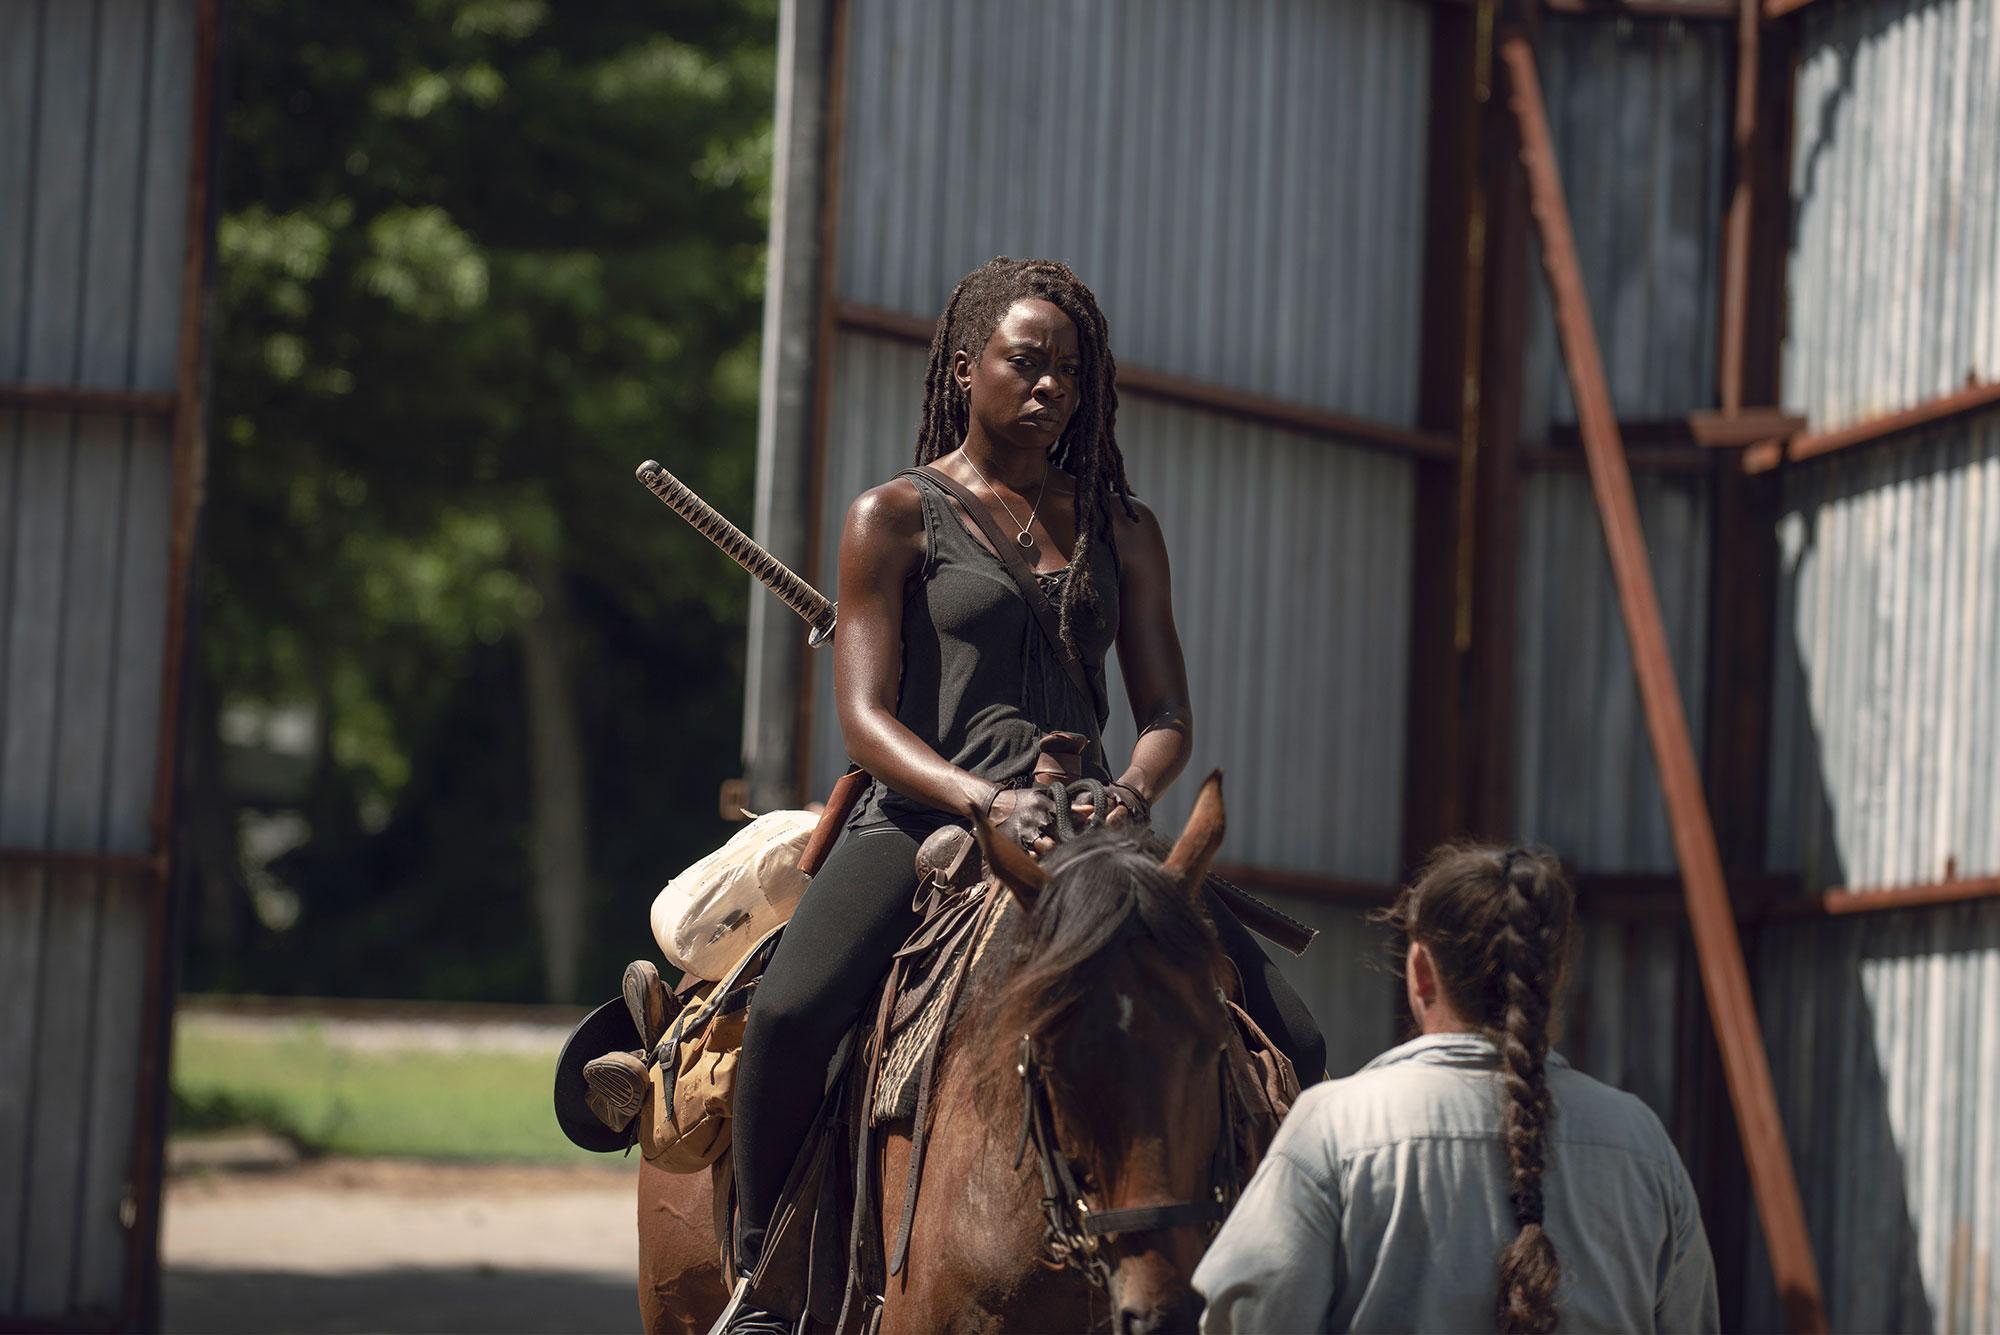 Danai Gurira the walking dead - Danai Gurira as Michonne – The Walking Dead _ Season 9, Episode 6